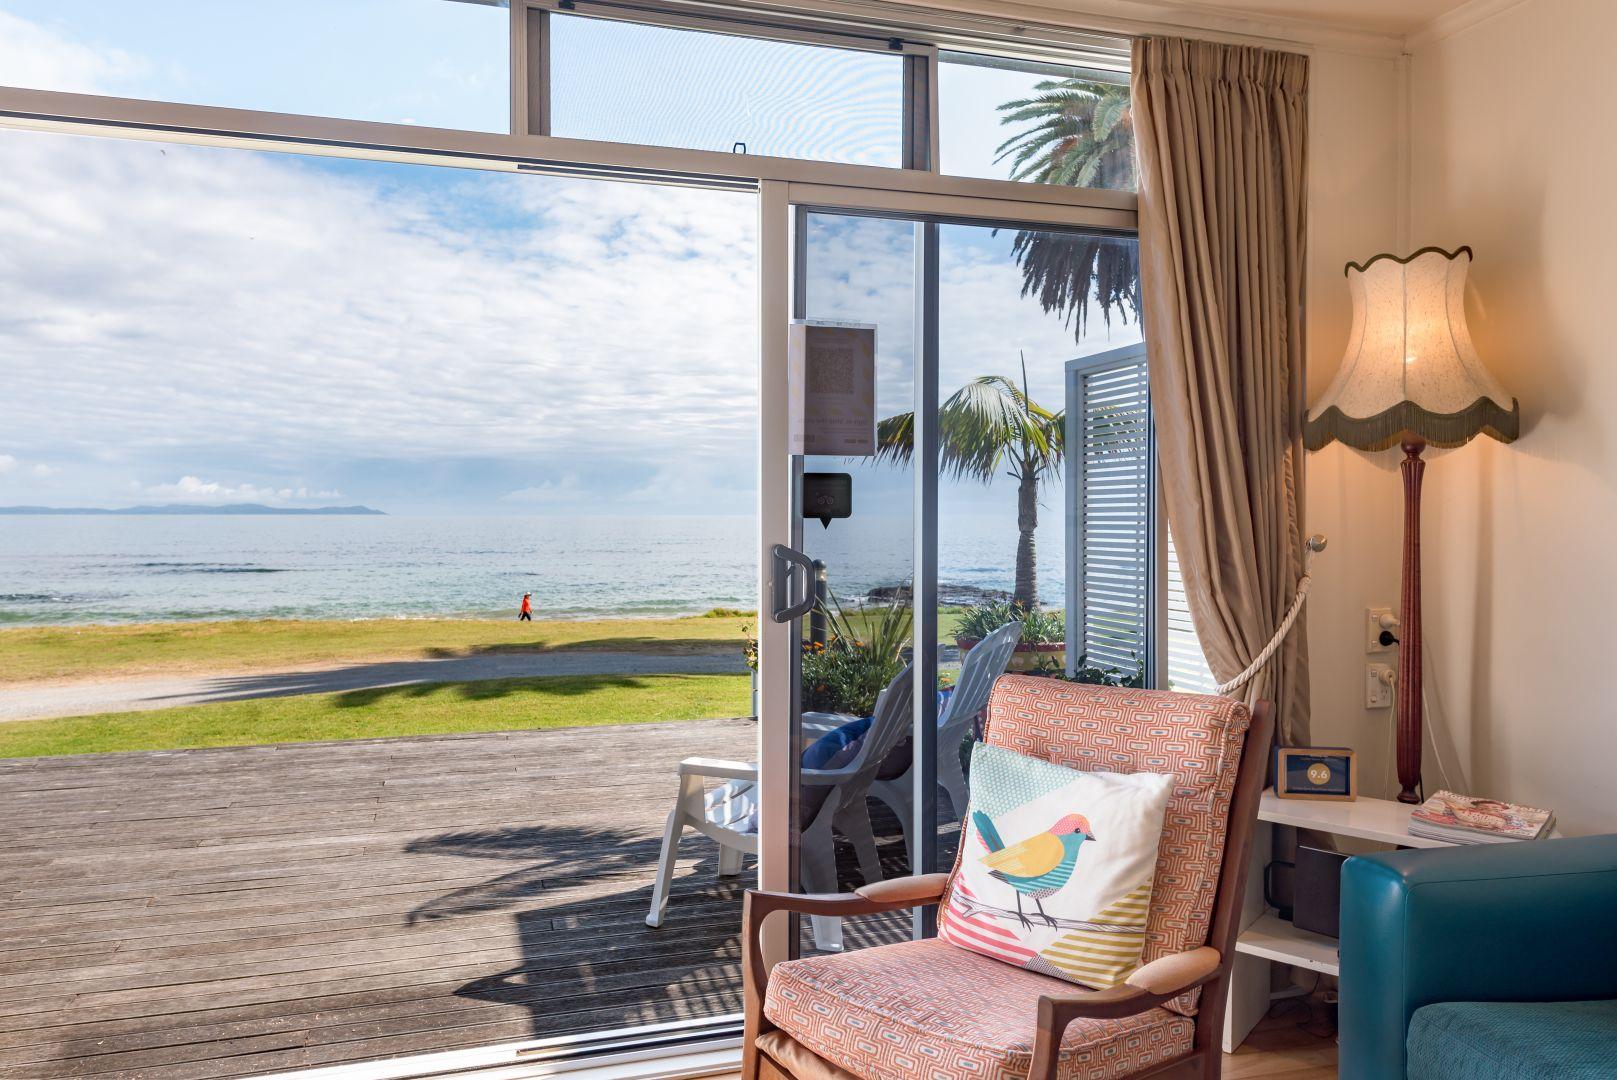 Kiwi Style Staycation